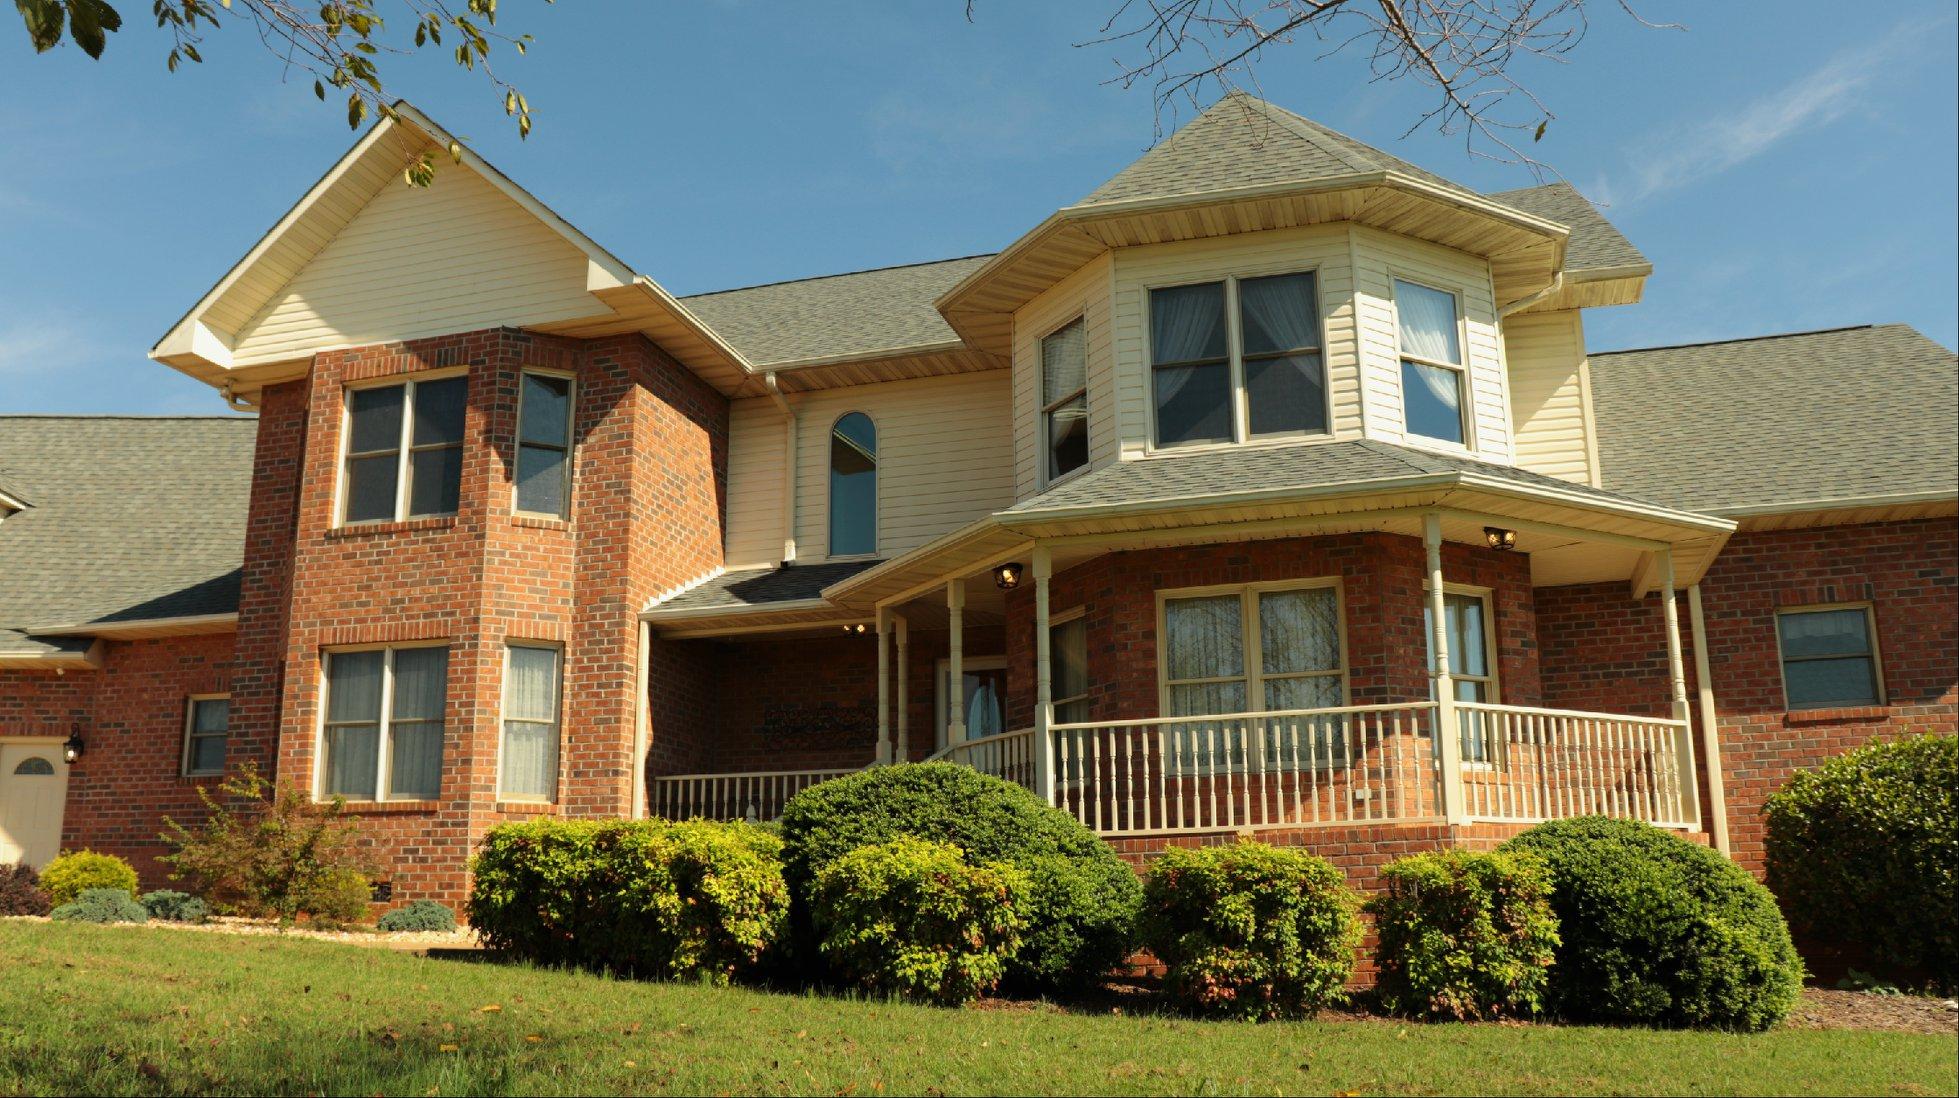 Foothills at Red Oak Recovery- Ellenboro, North Carolina.